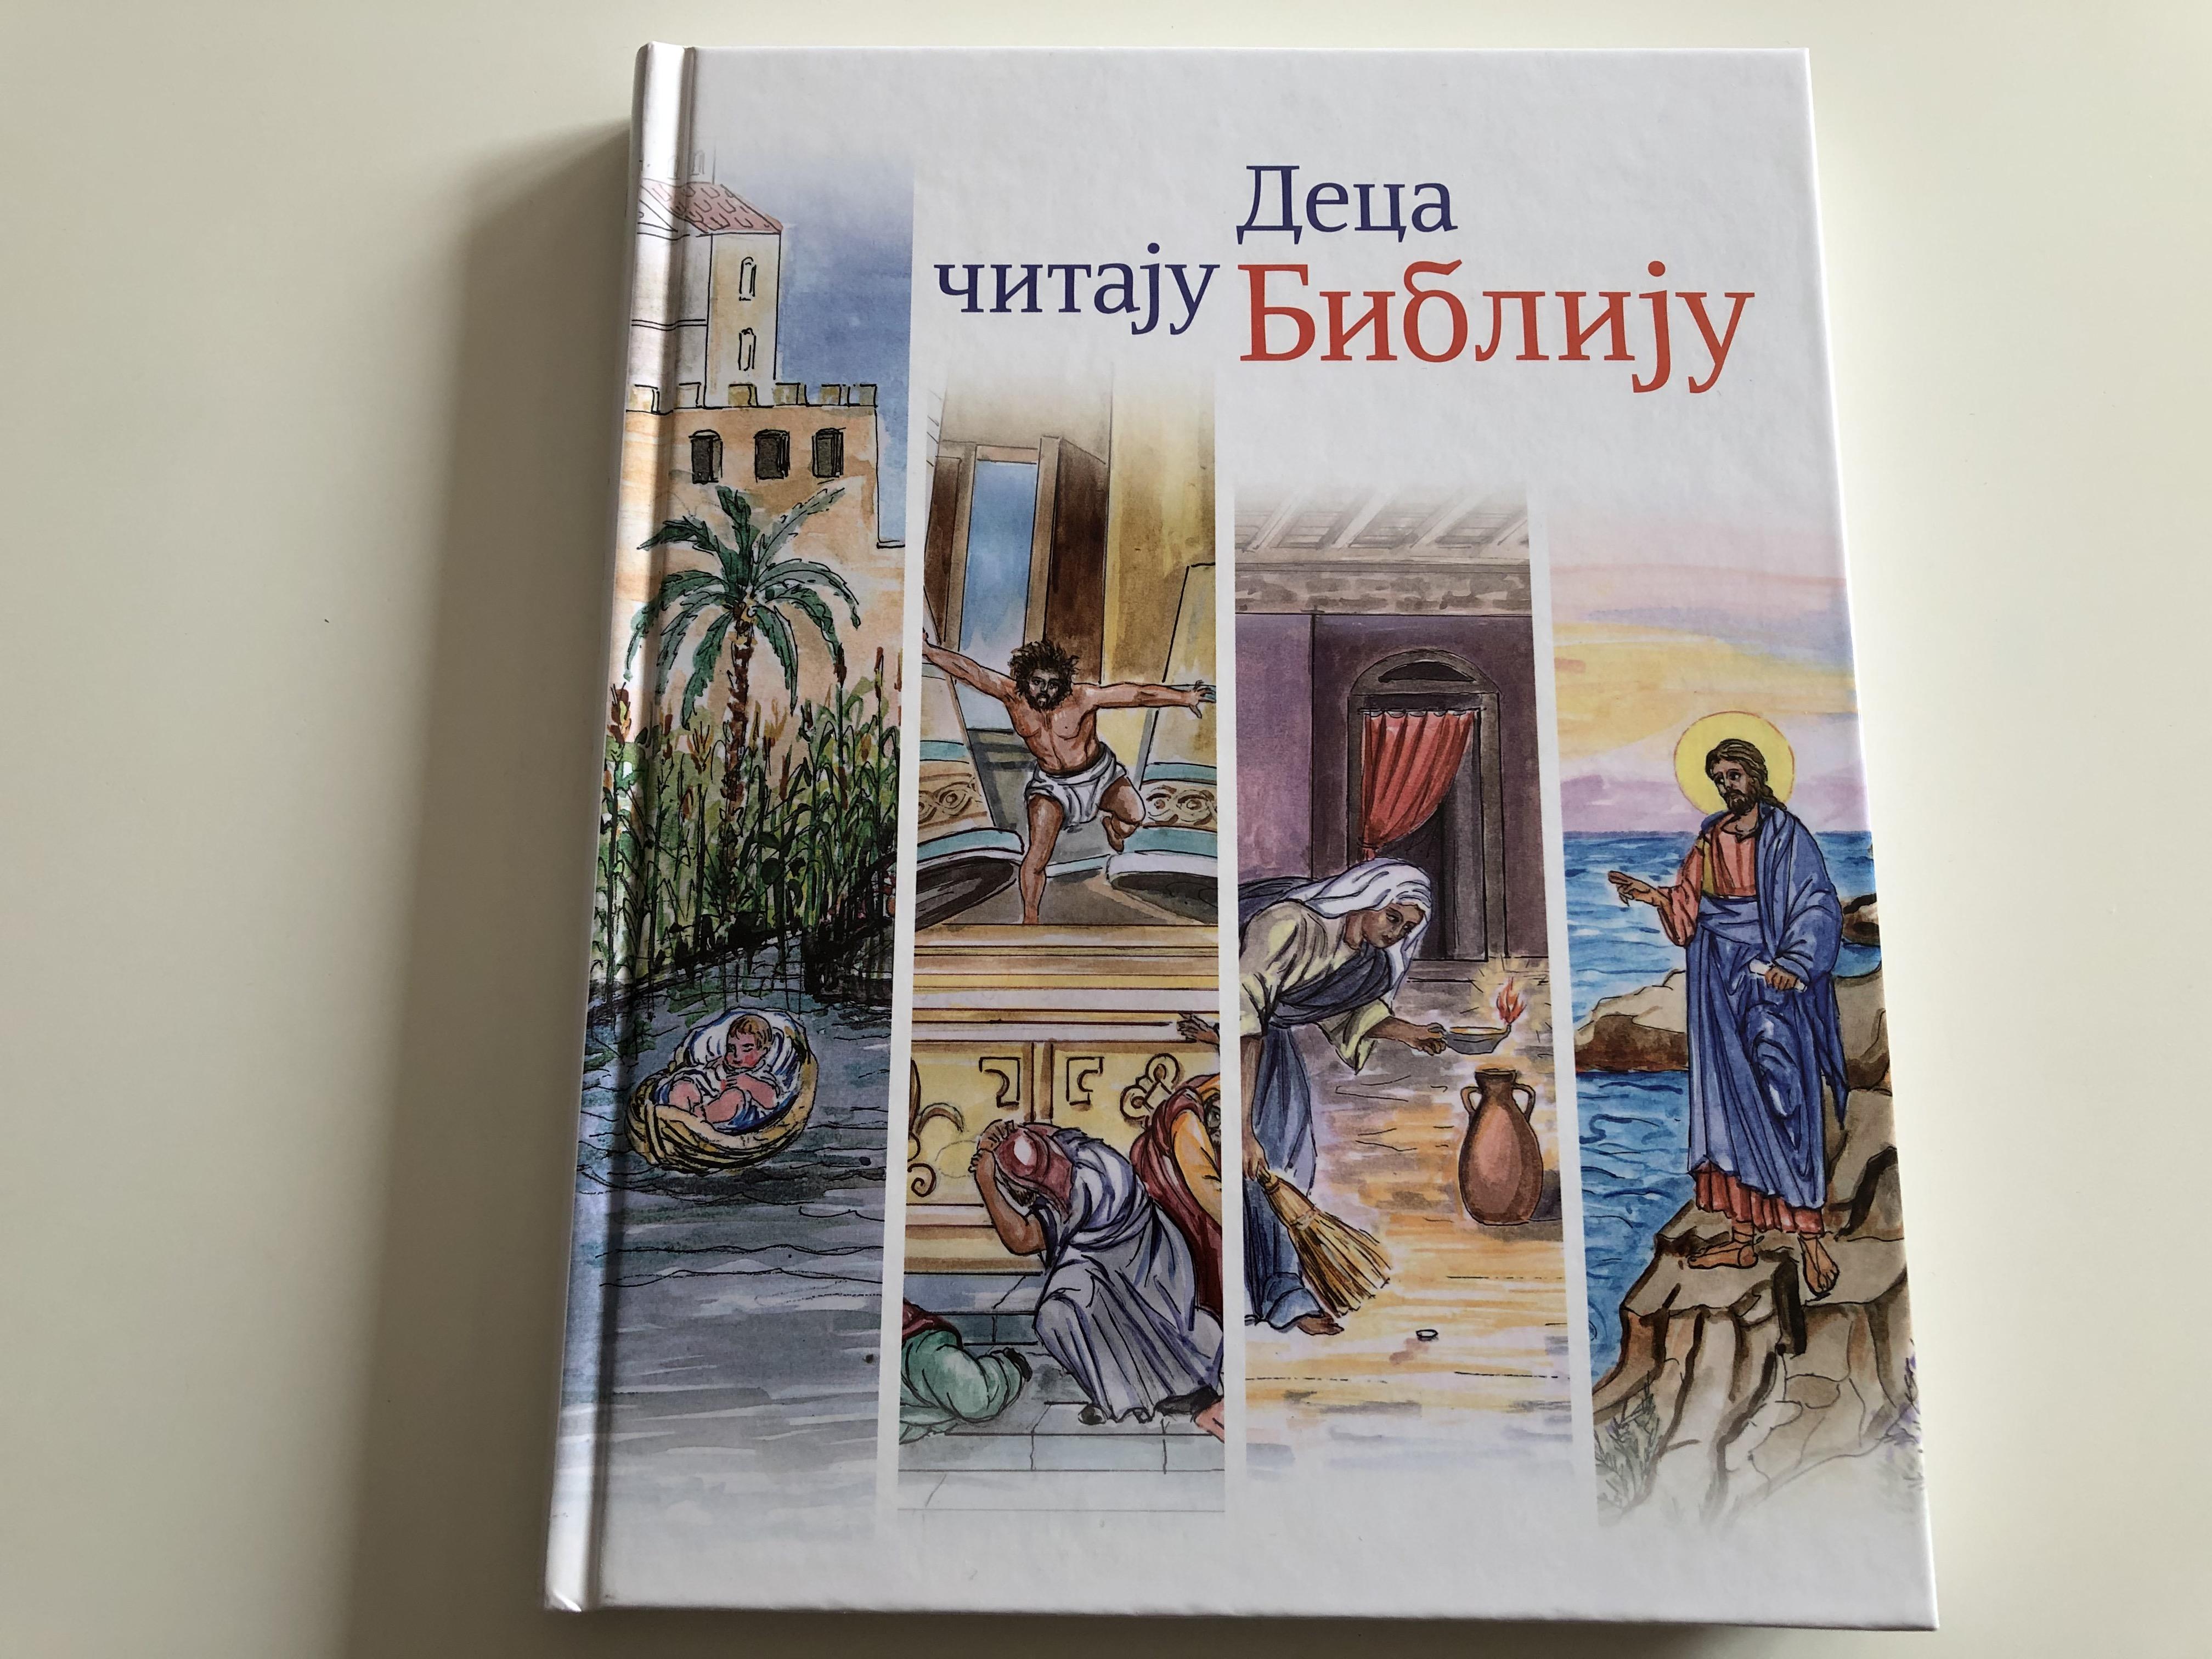 -by-marta-kapetanaku-ksinopulu-keti-hioteli-serbian-edition-of-children-s-bible-reader-1.jpg